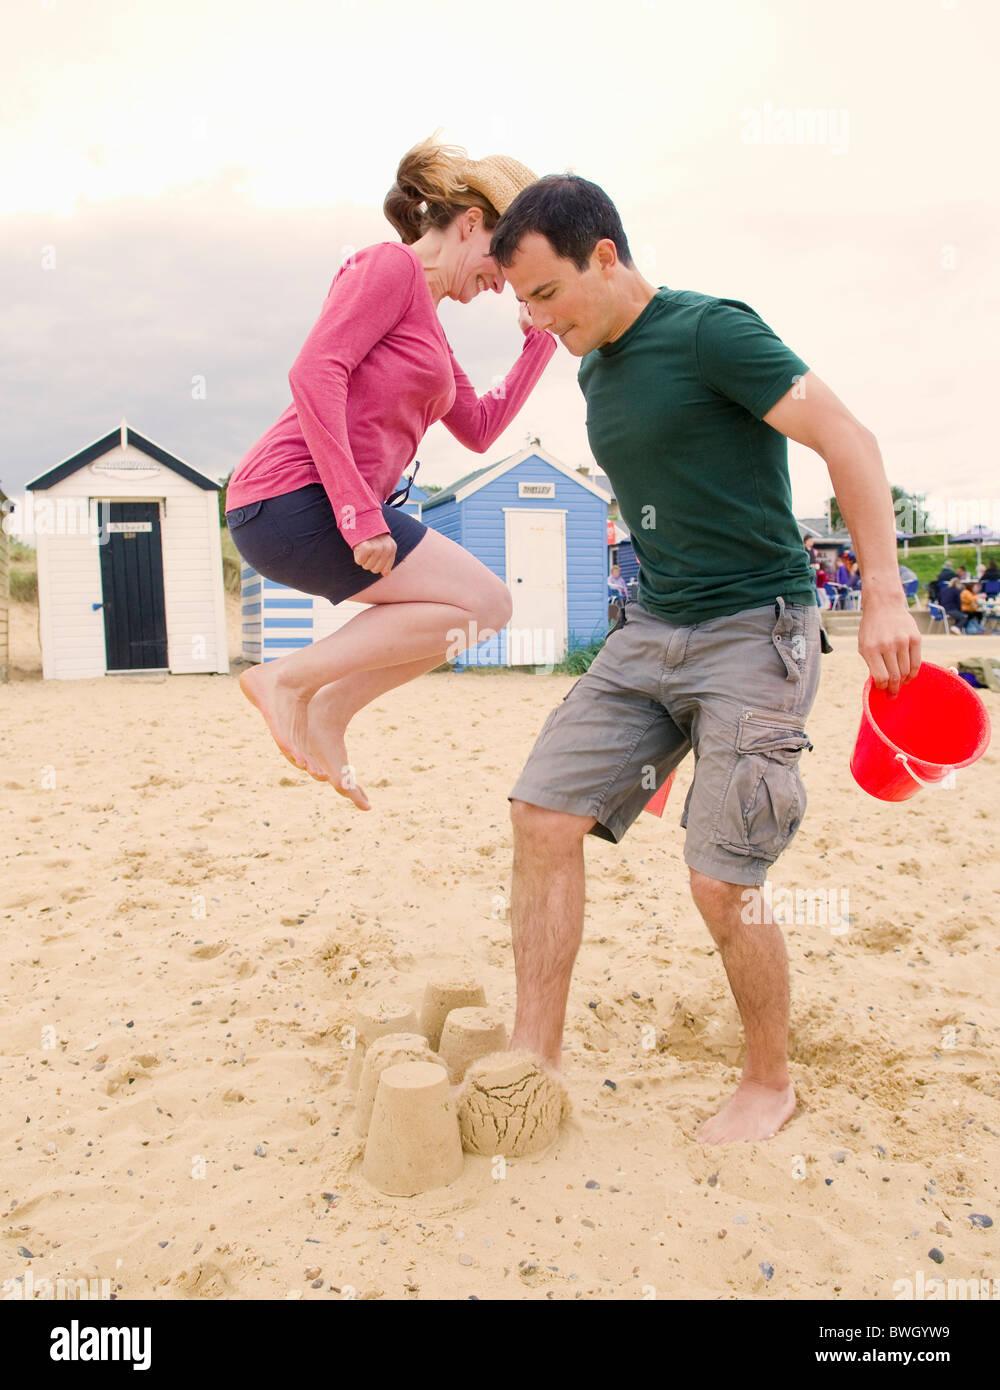 Couple destroy sandcastles - Stock Image